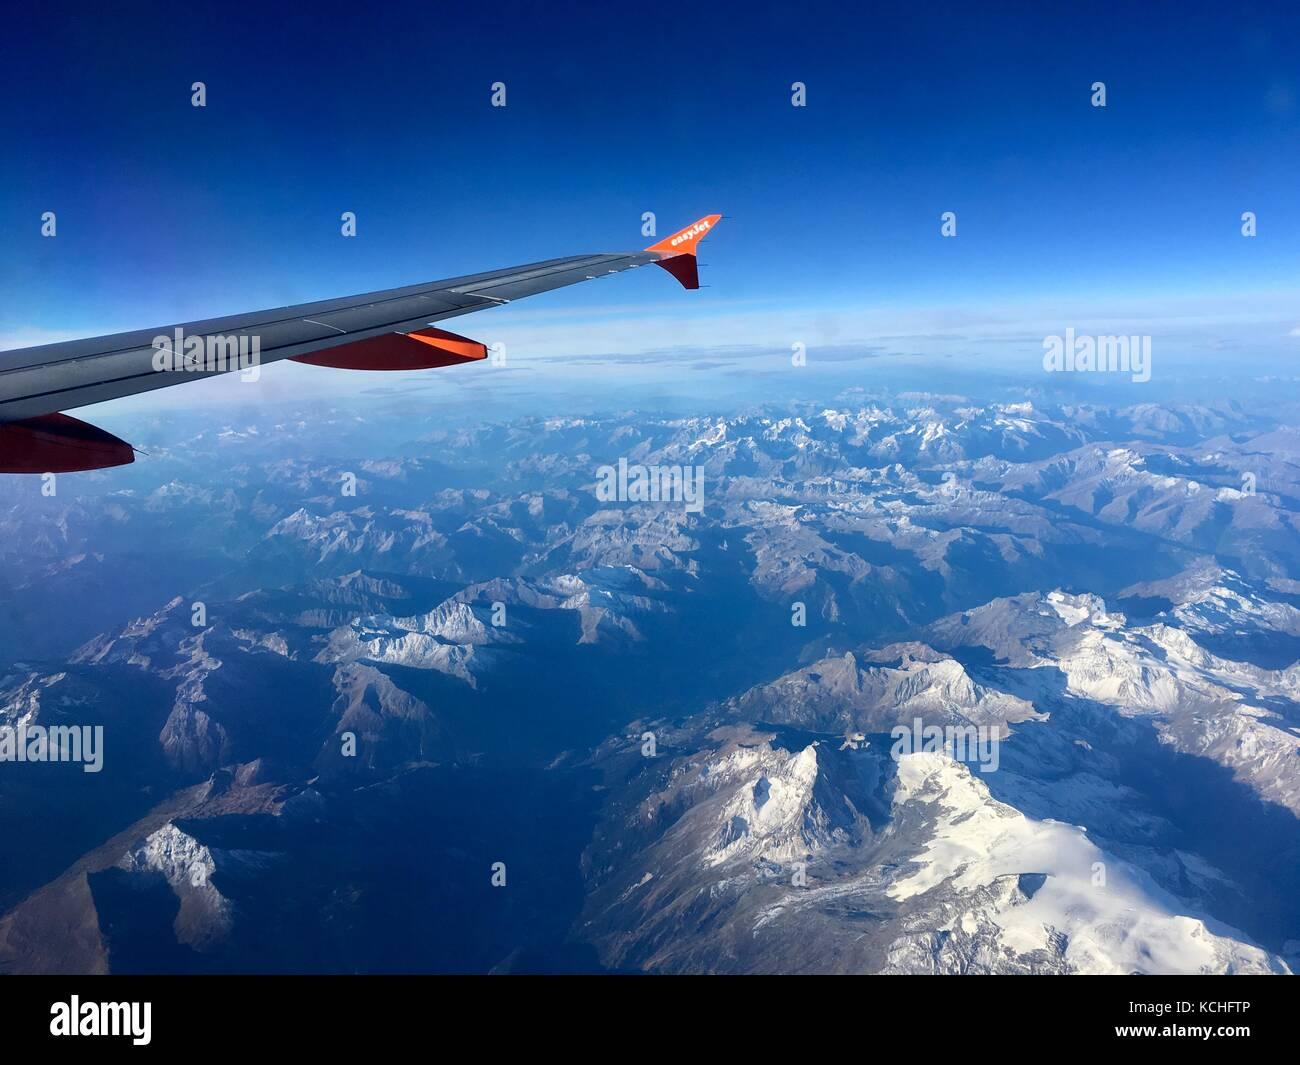 Easyjet - Stock Image